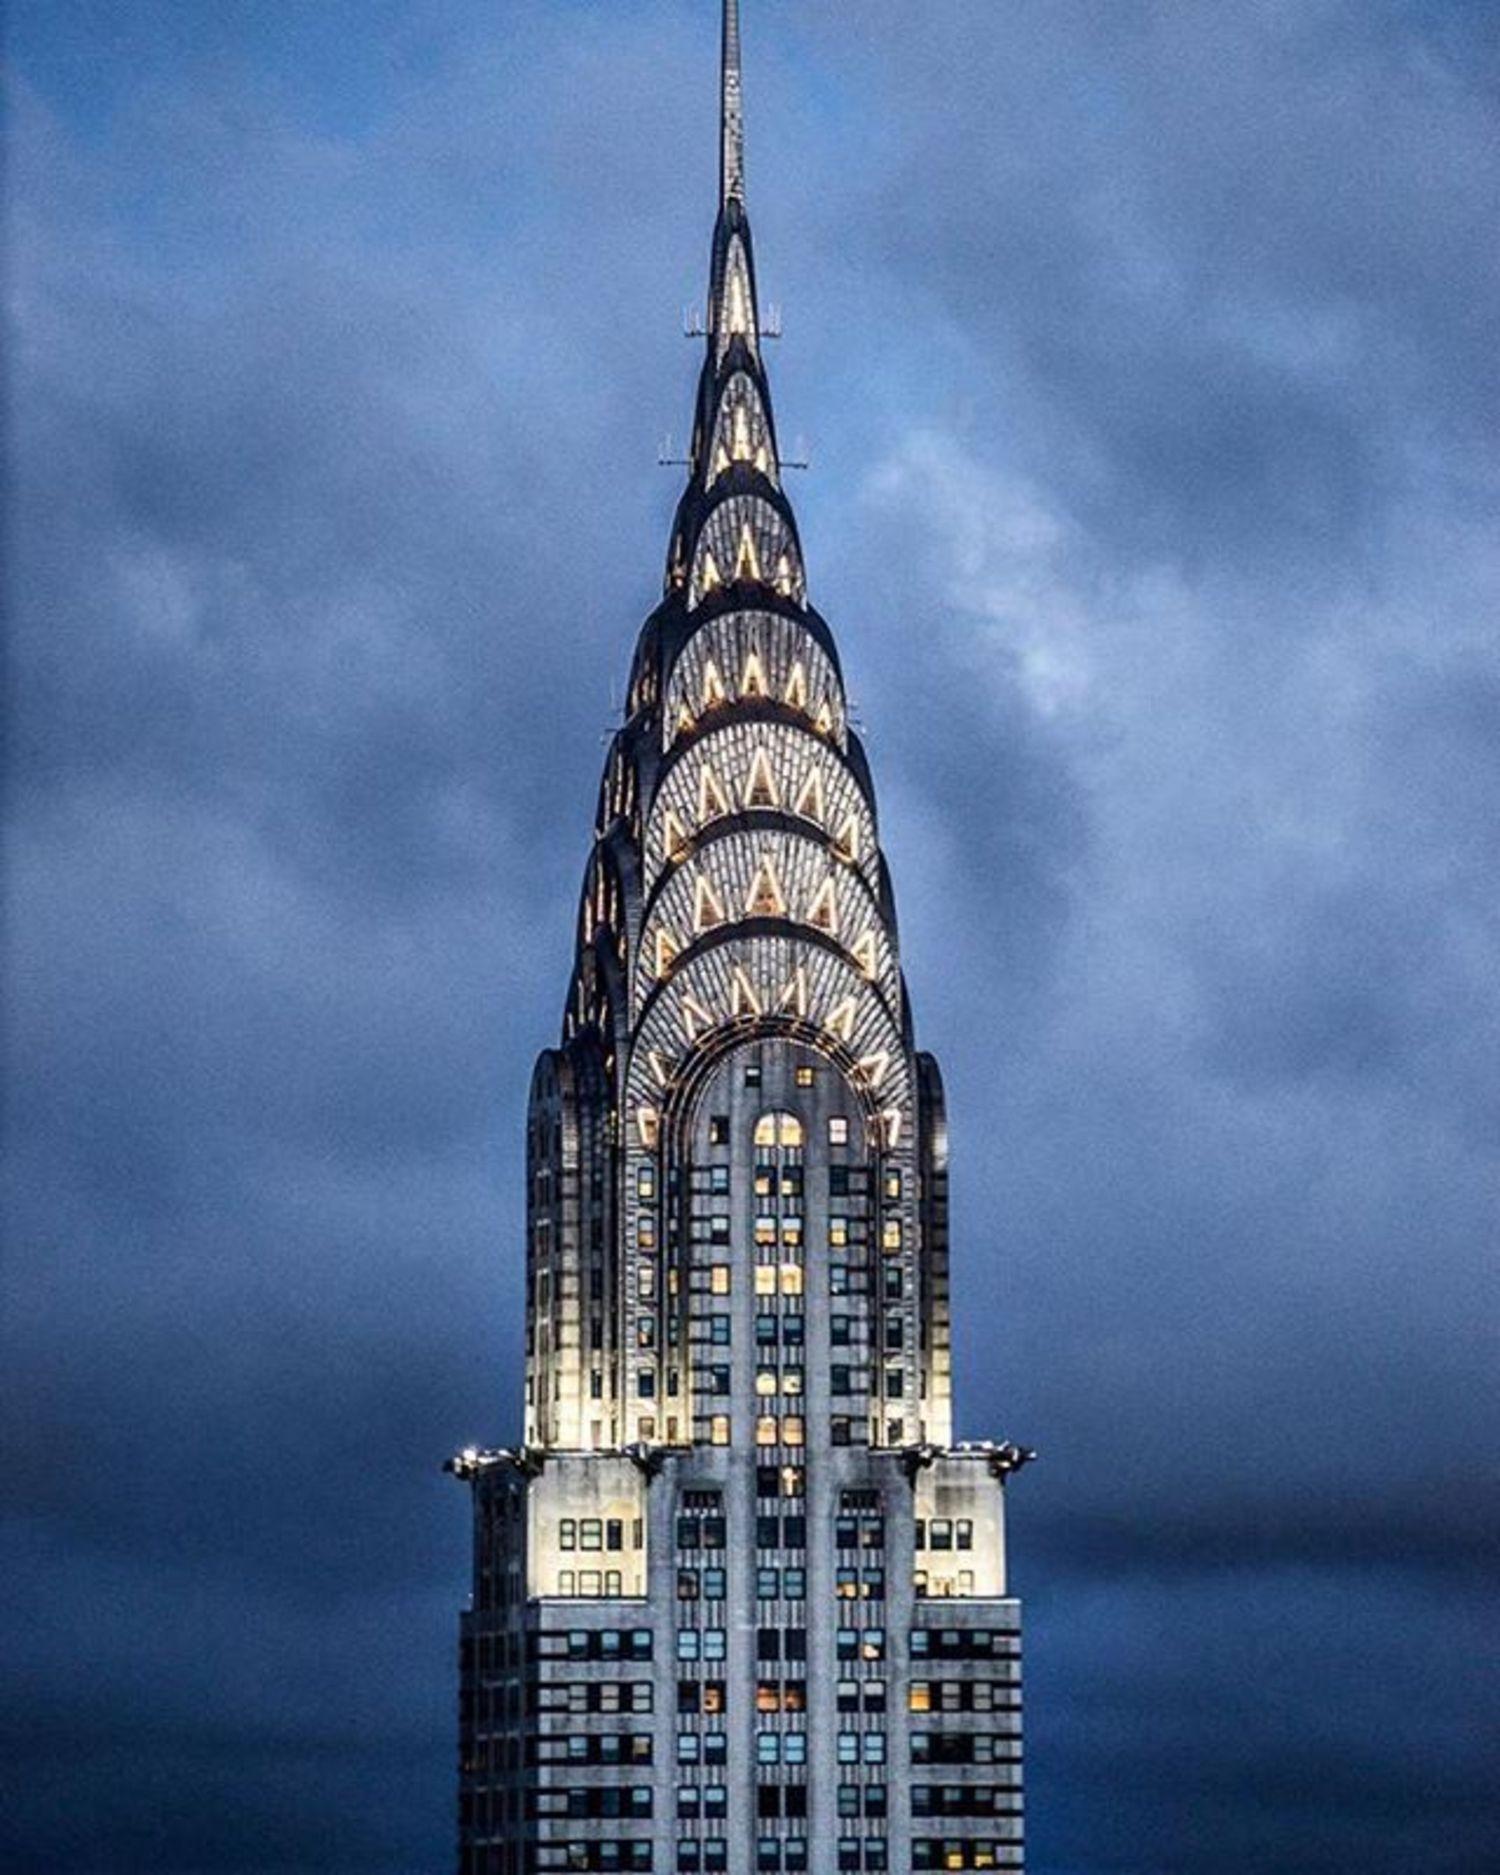 Chrysler Building, New York, New York. Photo via @brooklynveezy #viewingnyc #newyorkcity #newyork #nyc